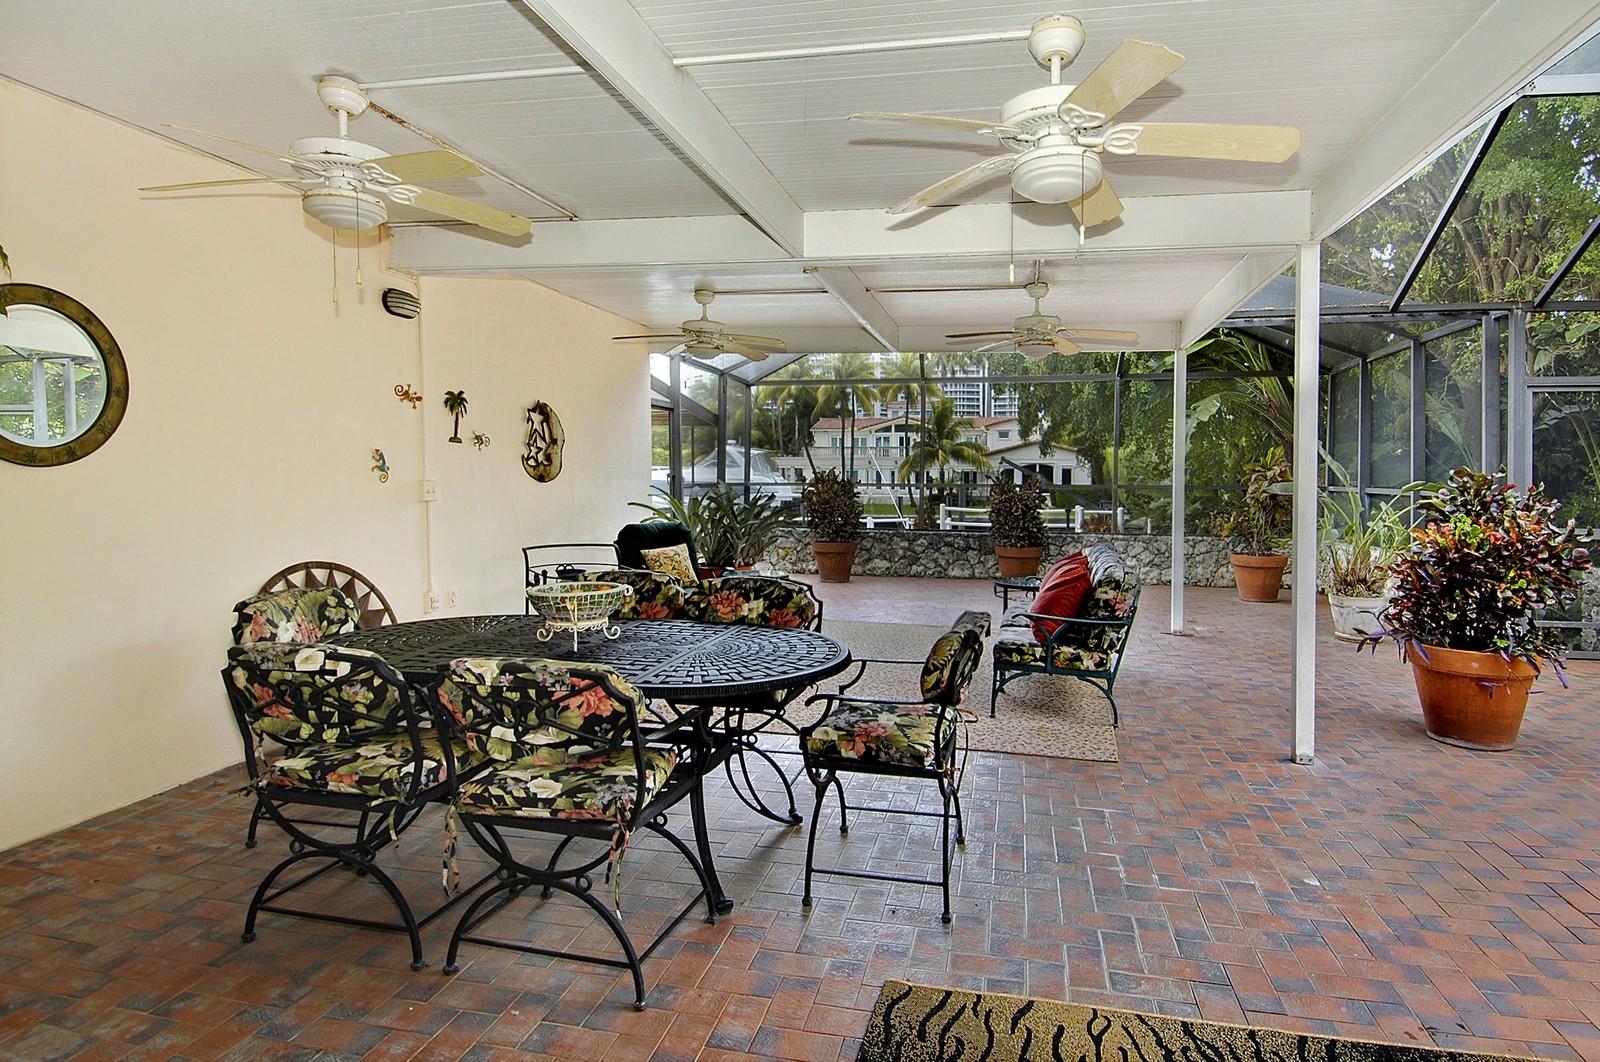 Real Estate Photography - 622 Golden Beach Dr, Golden Beach, FL, 33160 - Patio